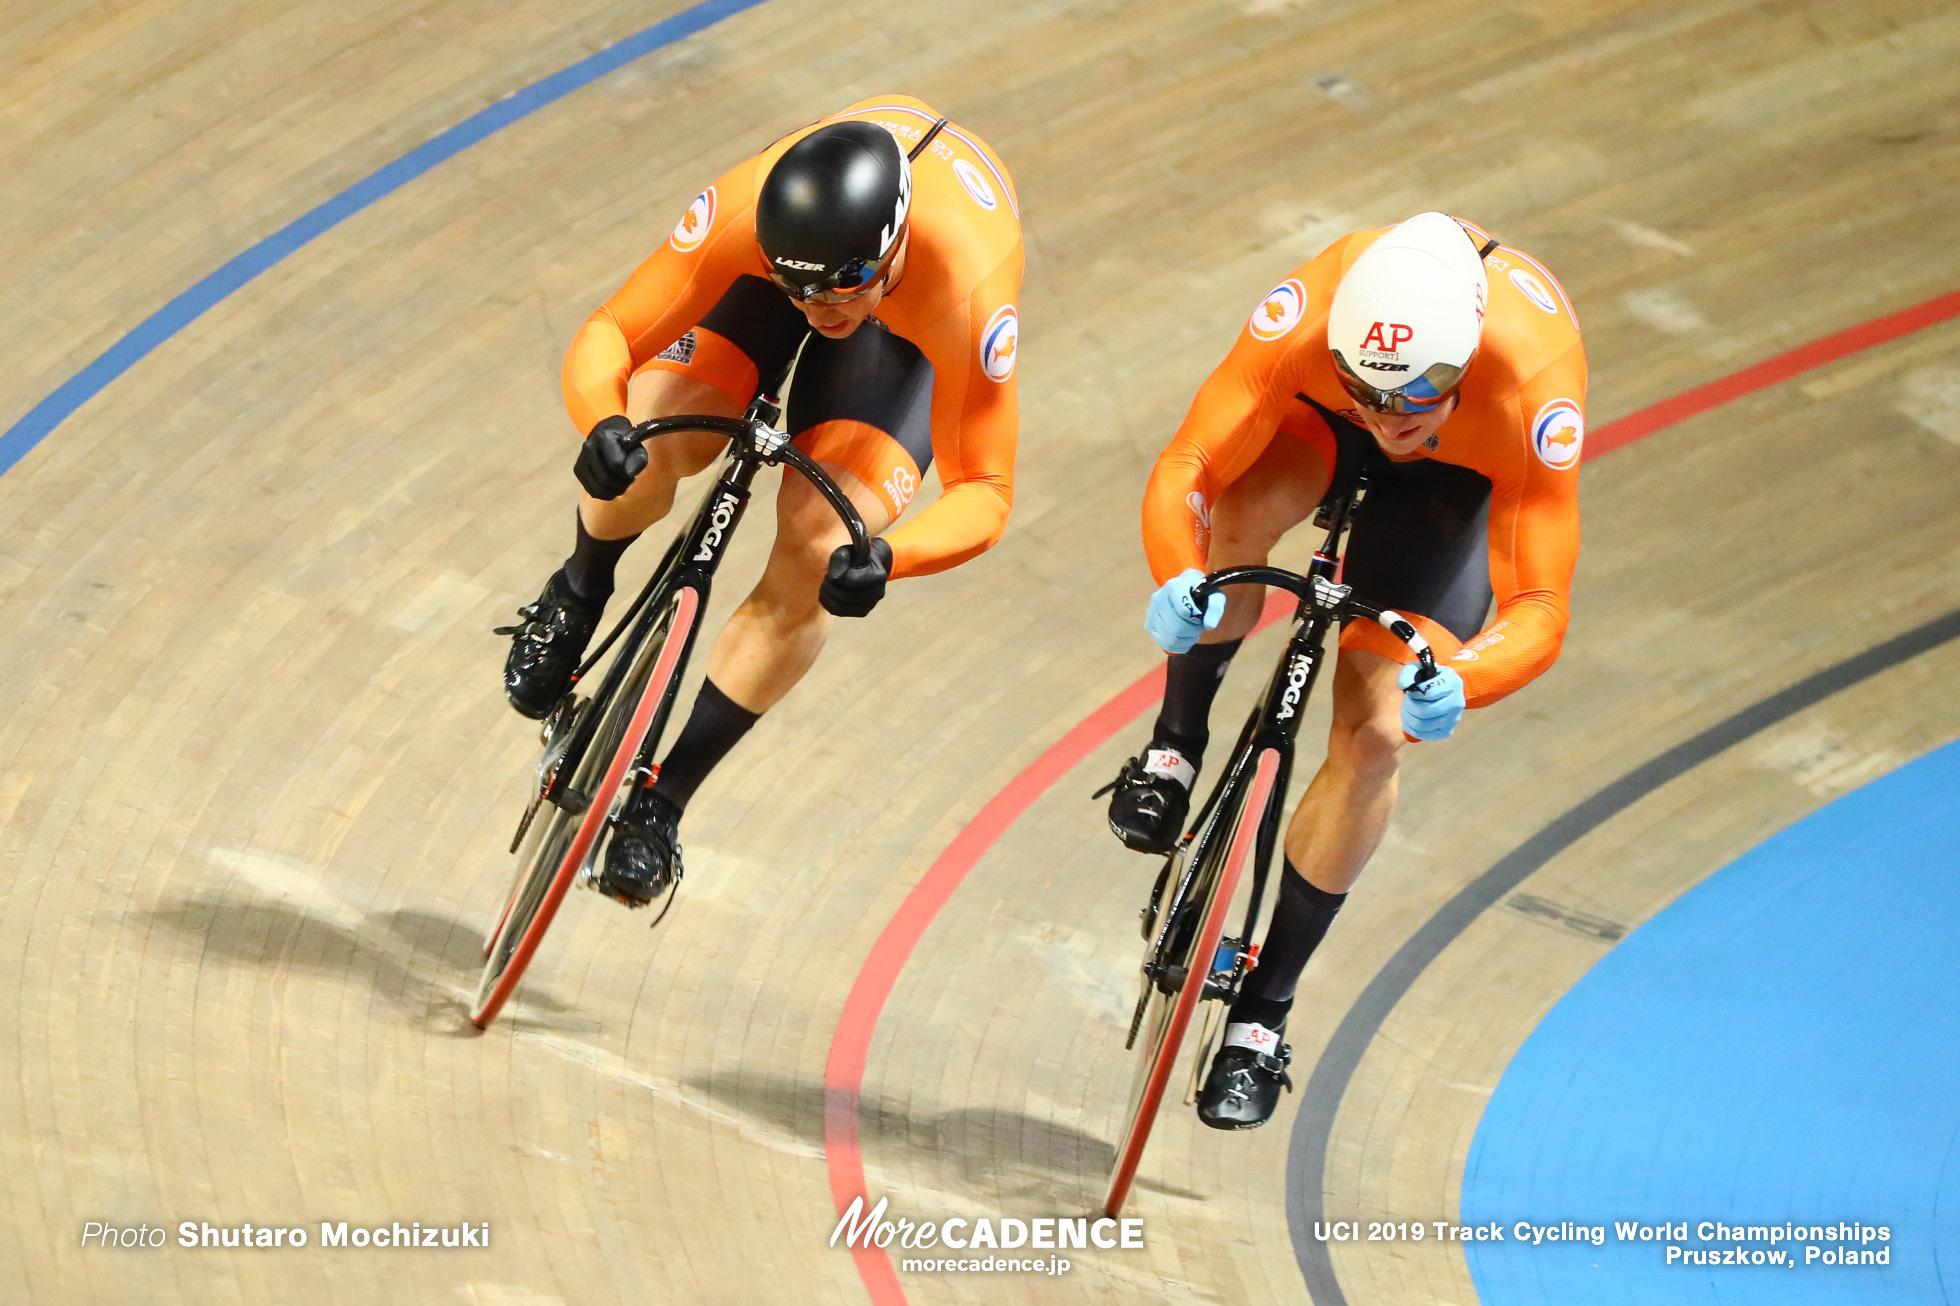 Men's Sprint Final / 2019 Track Cycling World Championships Pruszków, Poland